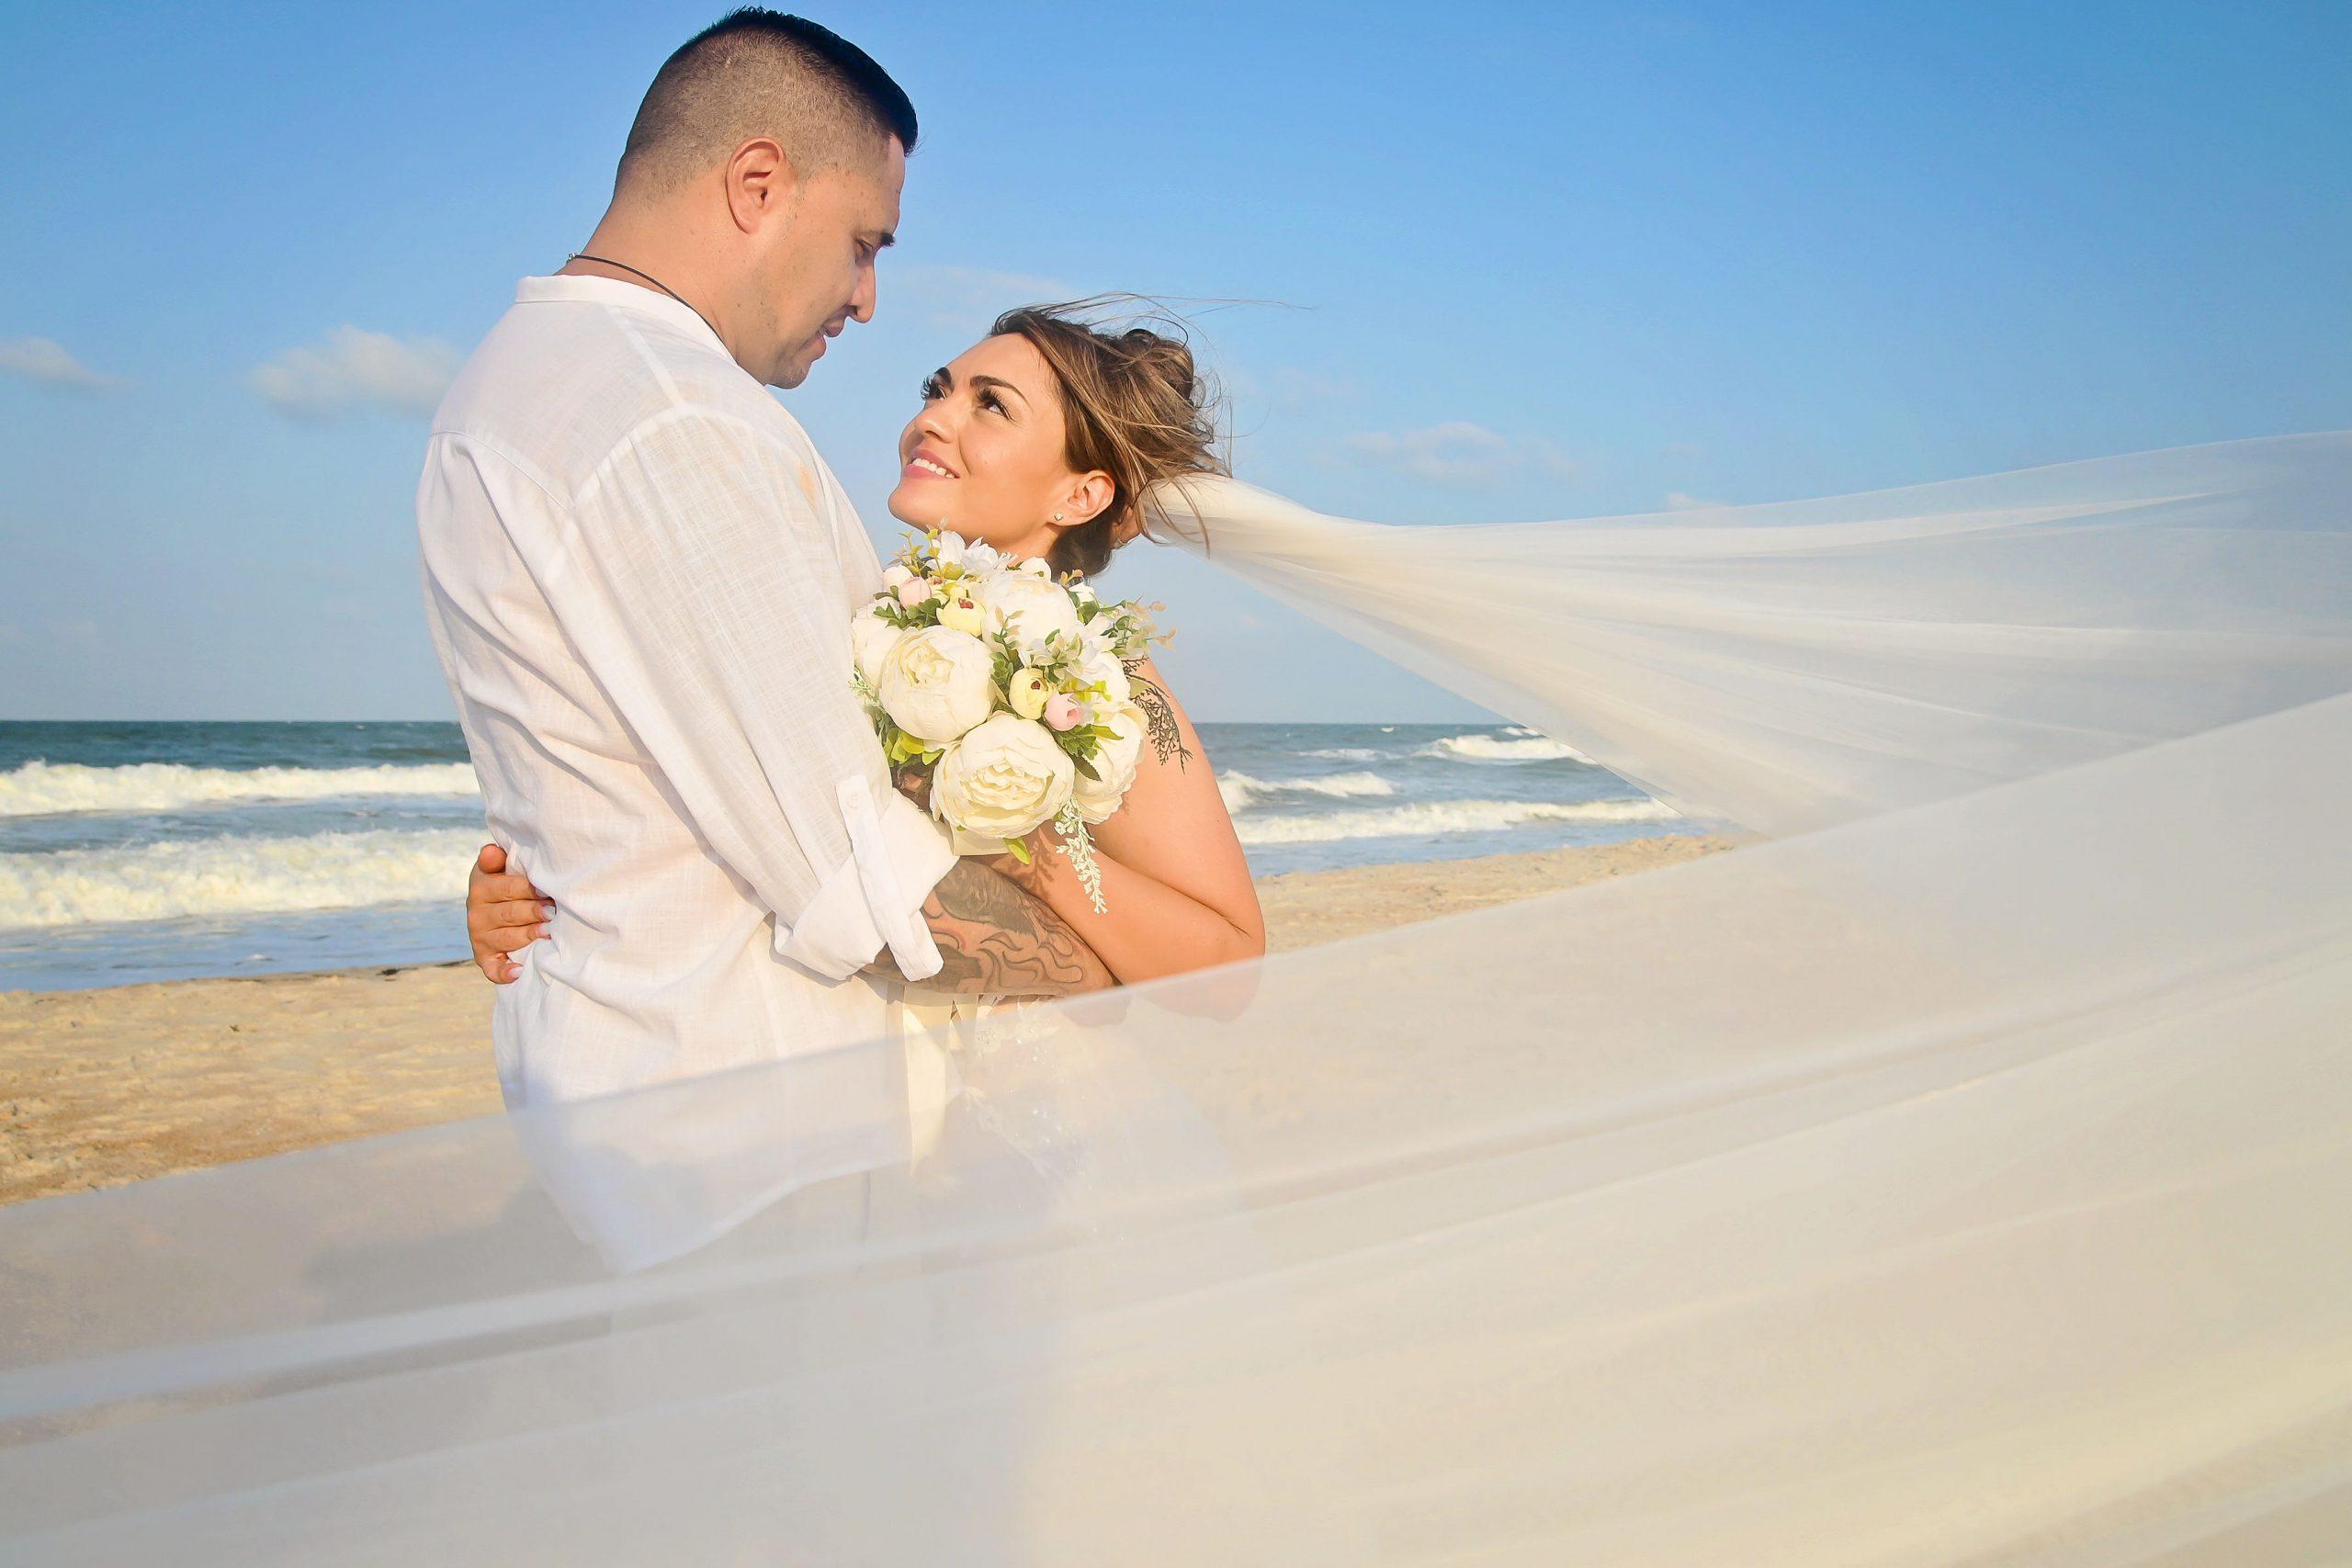 beach weddings in florida attire and design